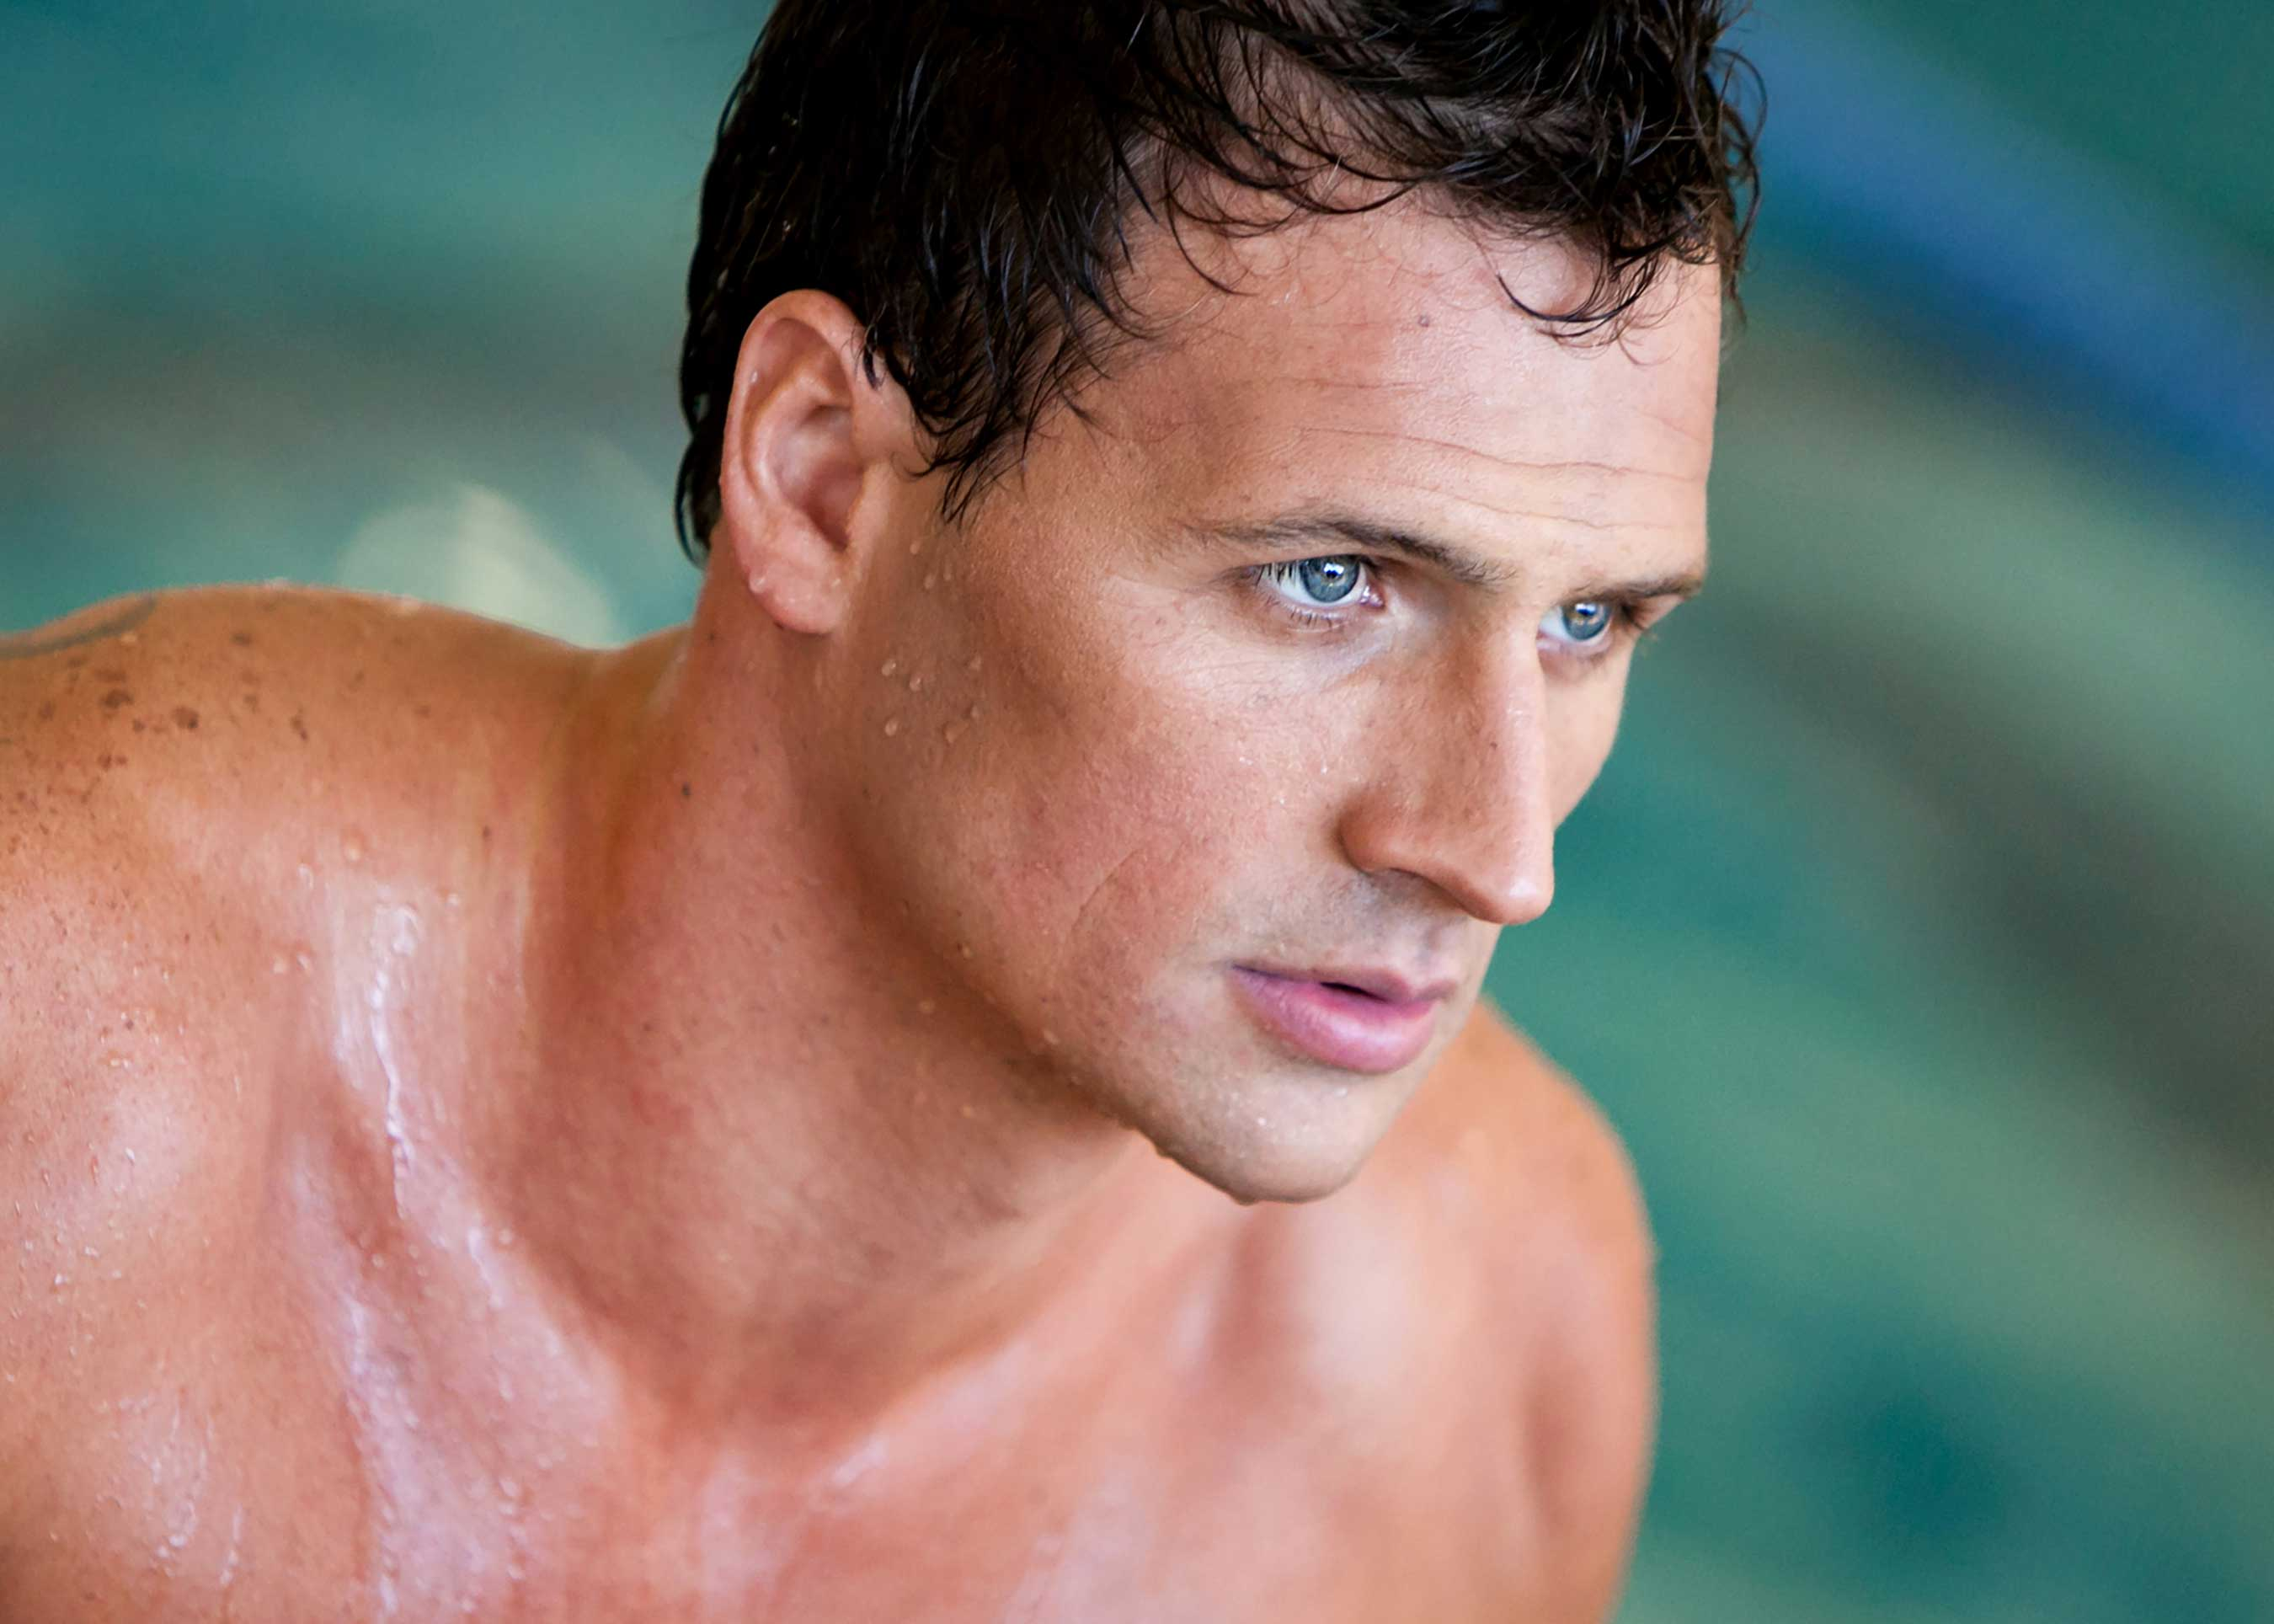 World Champion Swimmer Ryan Lochte serves as new brand ambassador for Syneron Candela's Gentle Laser Hair Removal